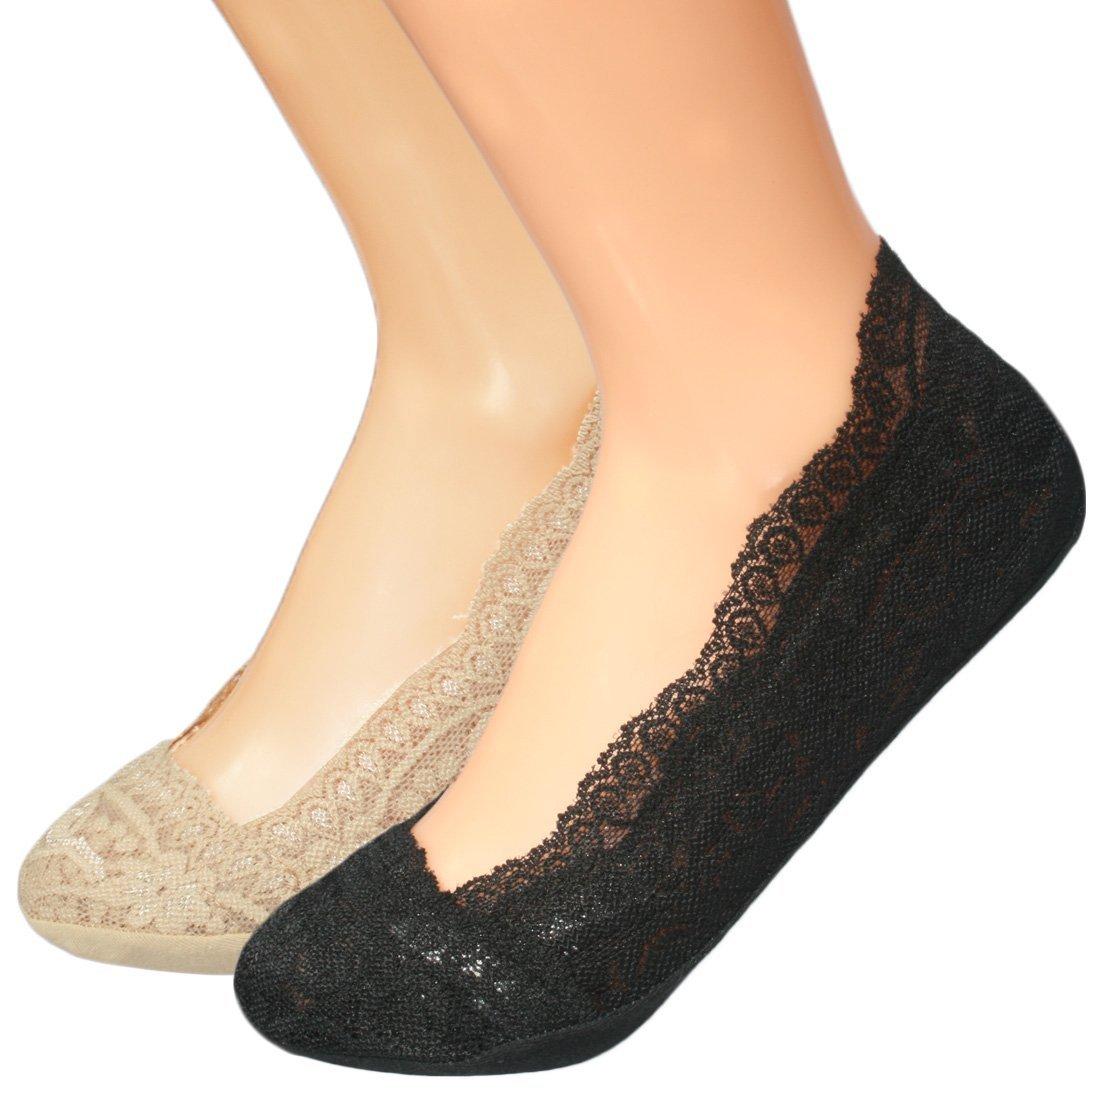 kilofly No Show Full Cuff Silicone Grip Non-Skid Socks [Set of 2, Black & Beige] FTW364set2